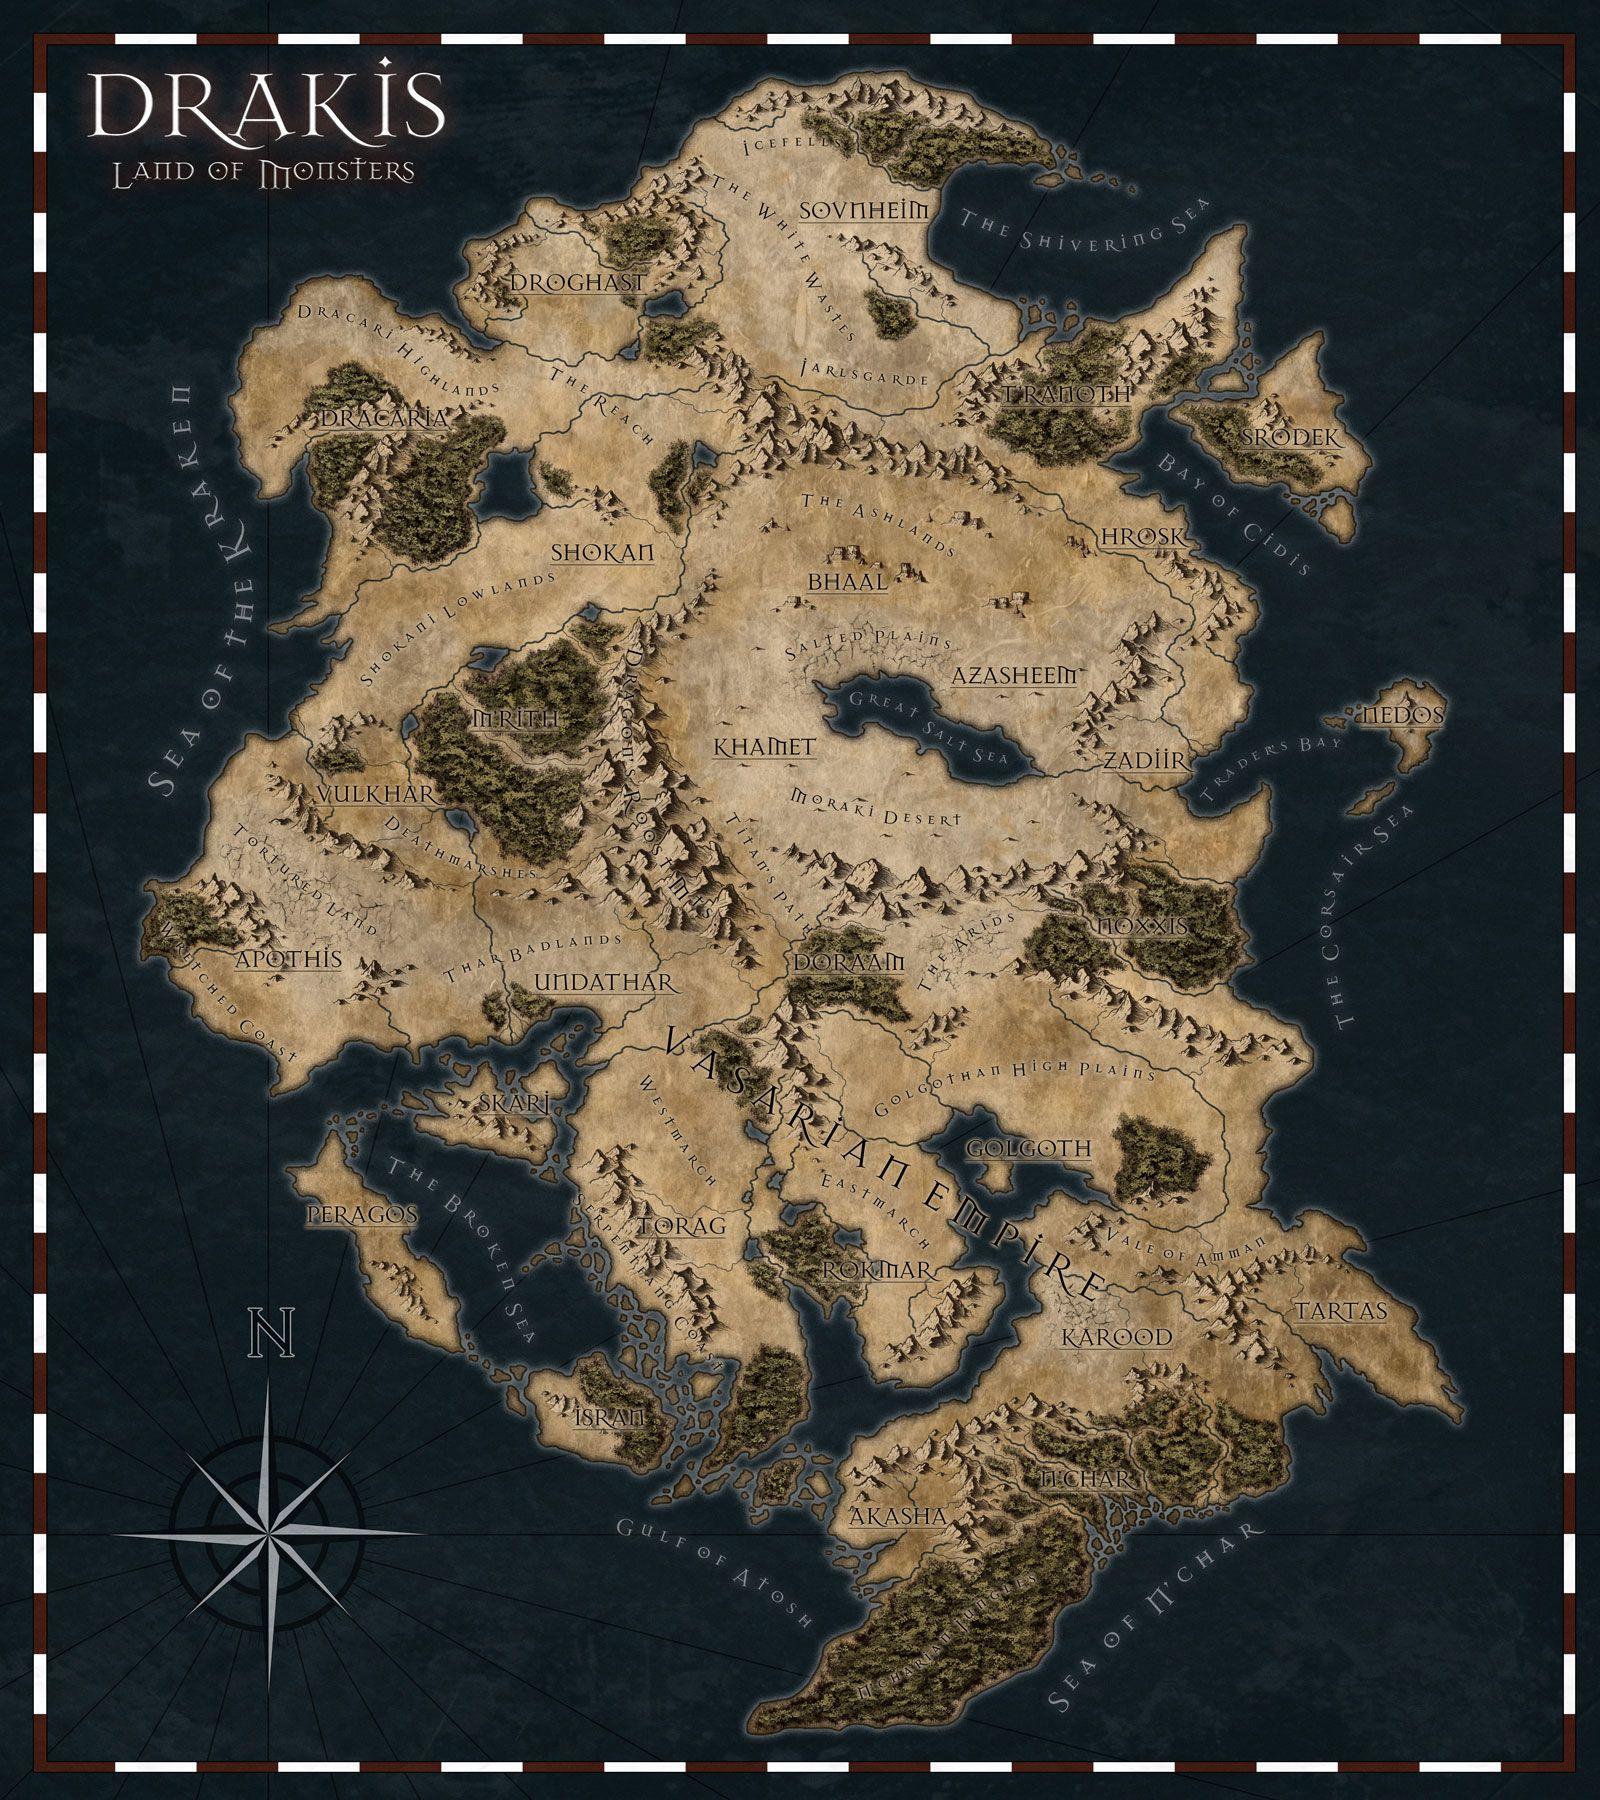 http://www.cartographersguild.com/attachments/finished-maps/61479d1392582499-drakis-land-monsters-drakis.jpg